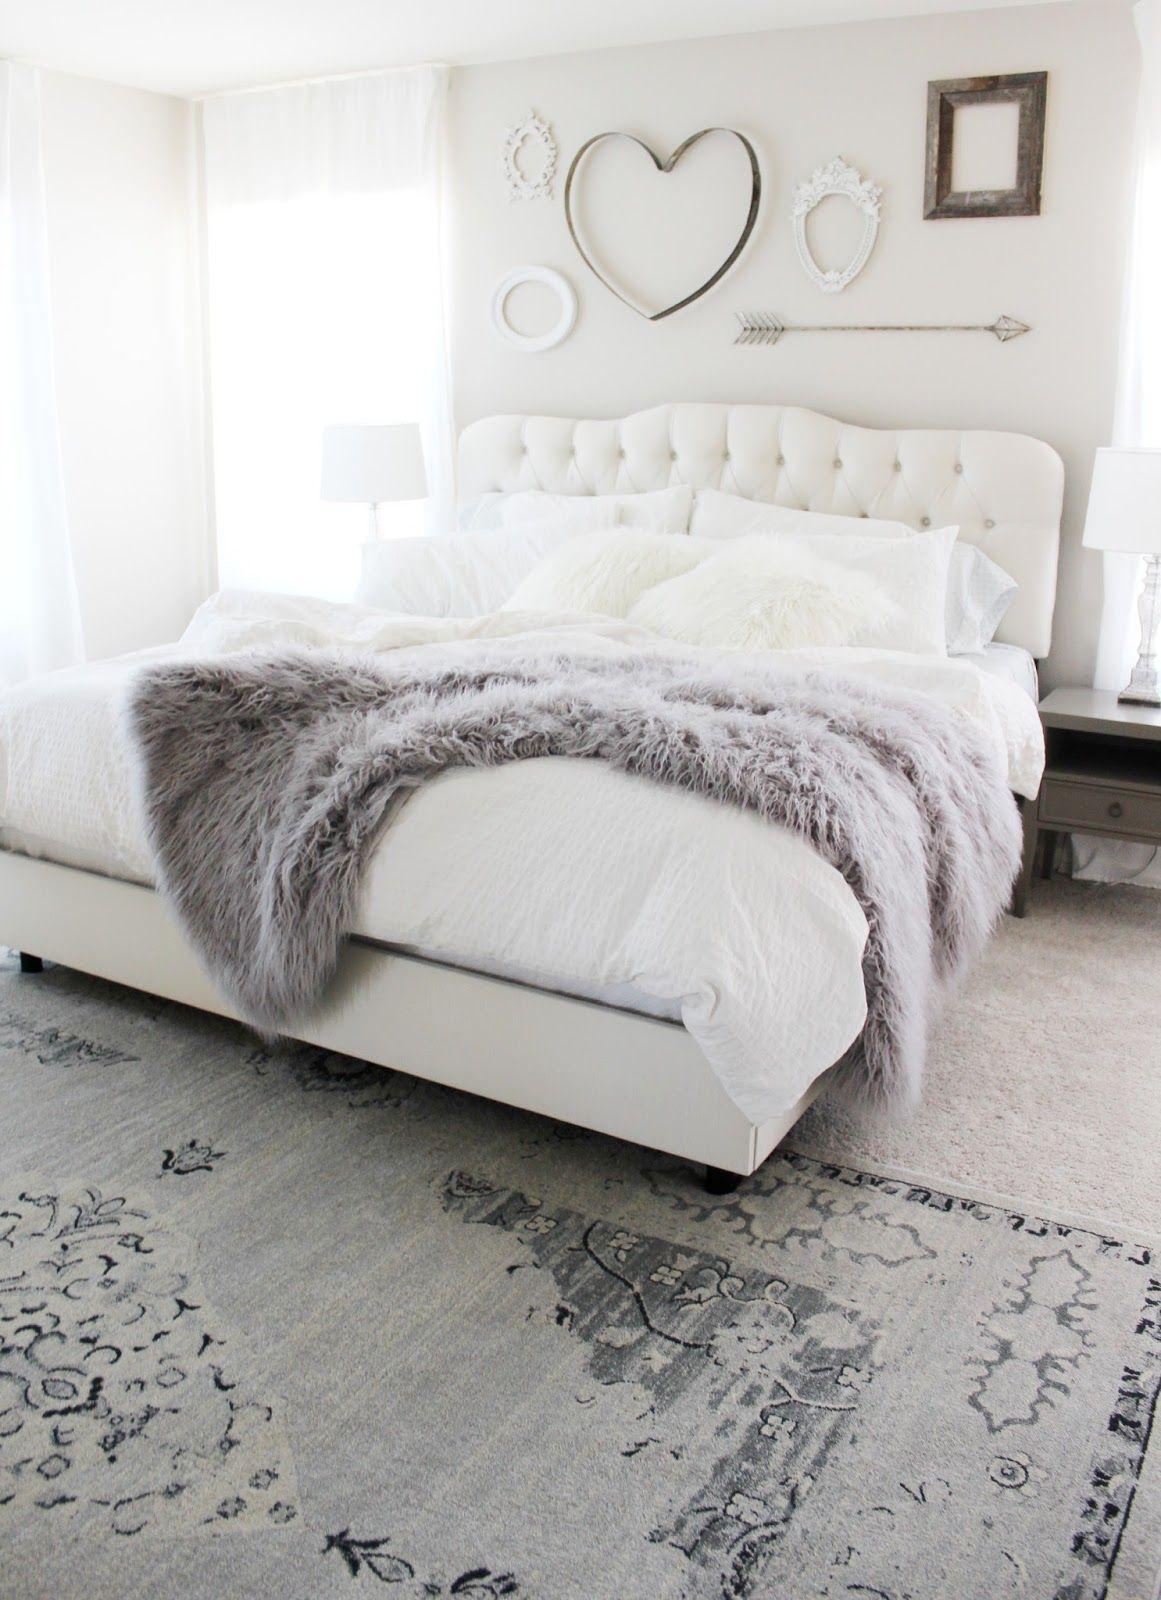 3 master bedroom apartments  Aubrey Kinch  The Blog Master Bedroom  Reveal  ucAPARTMENTuc